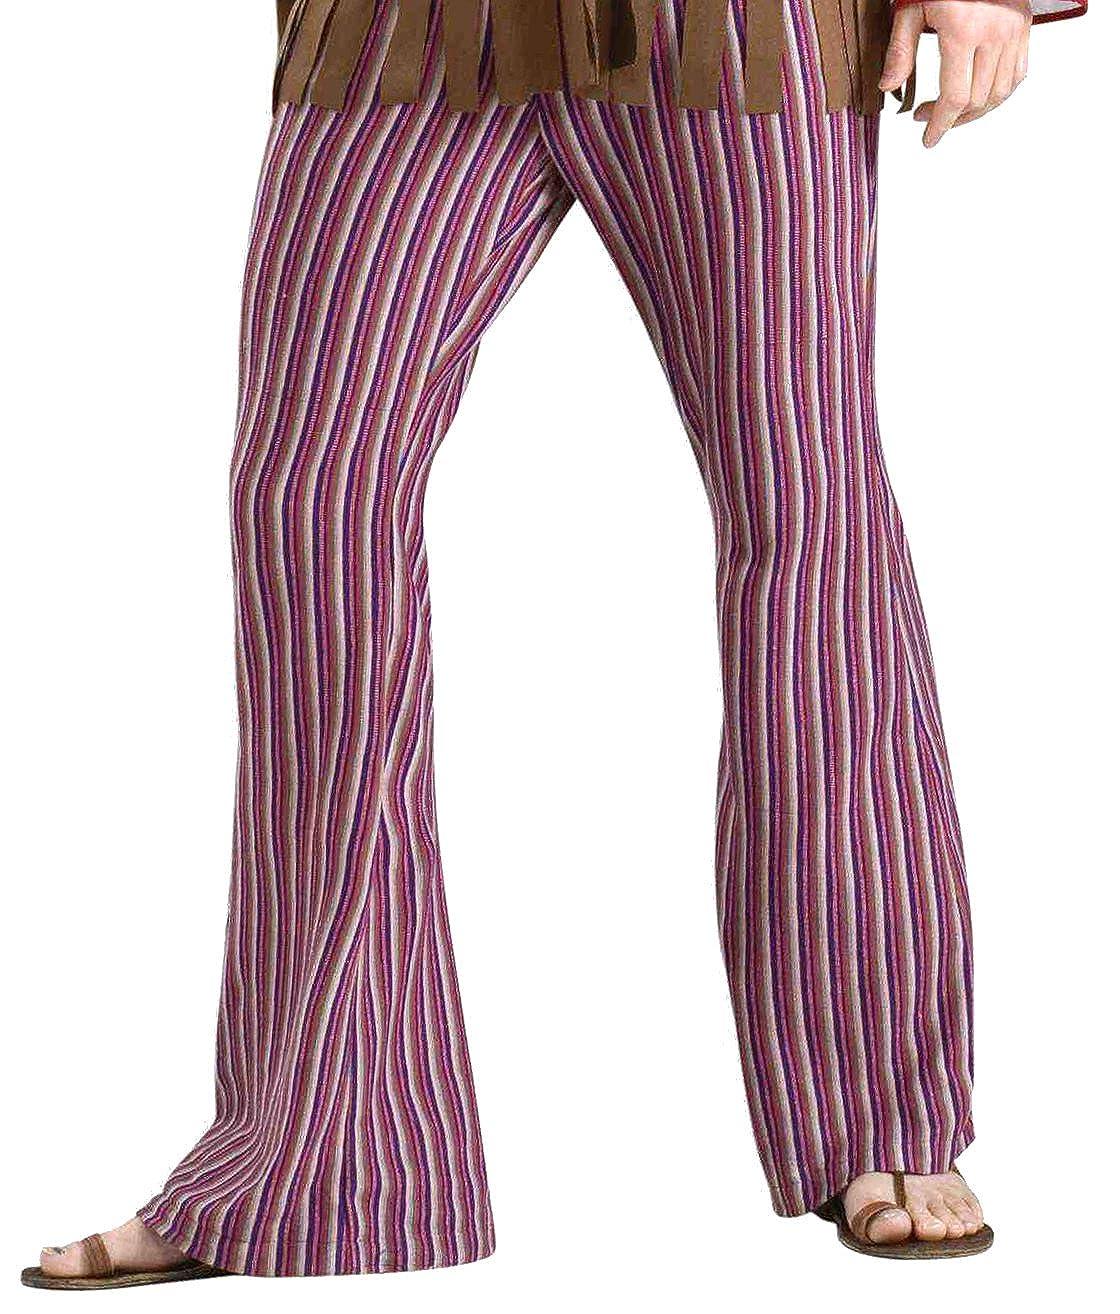 Forum Novelties Men's Far Out Bell Bottoms Hippie Costume Pants Multi Standard Forum Novelties Costumes 61937